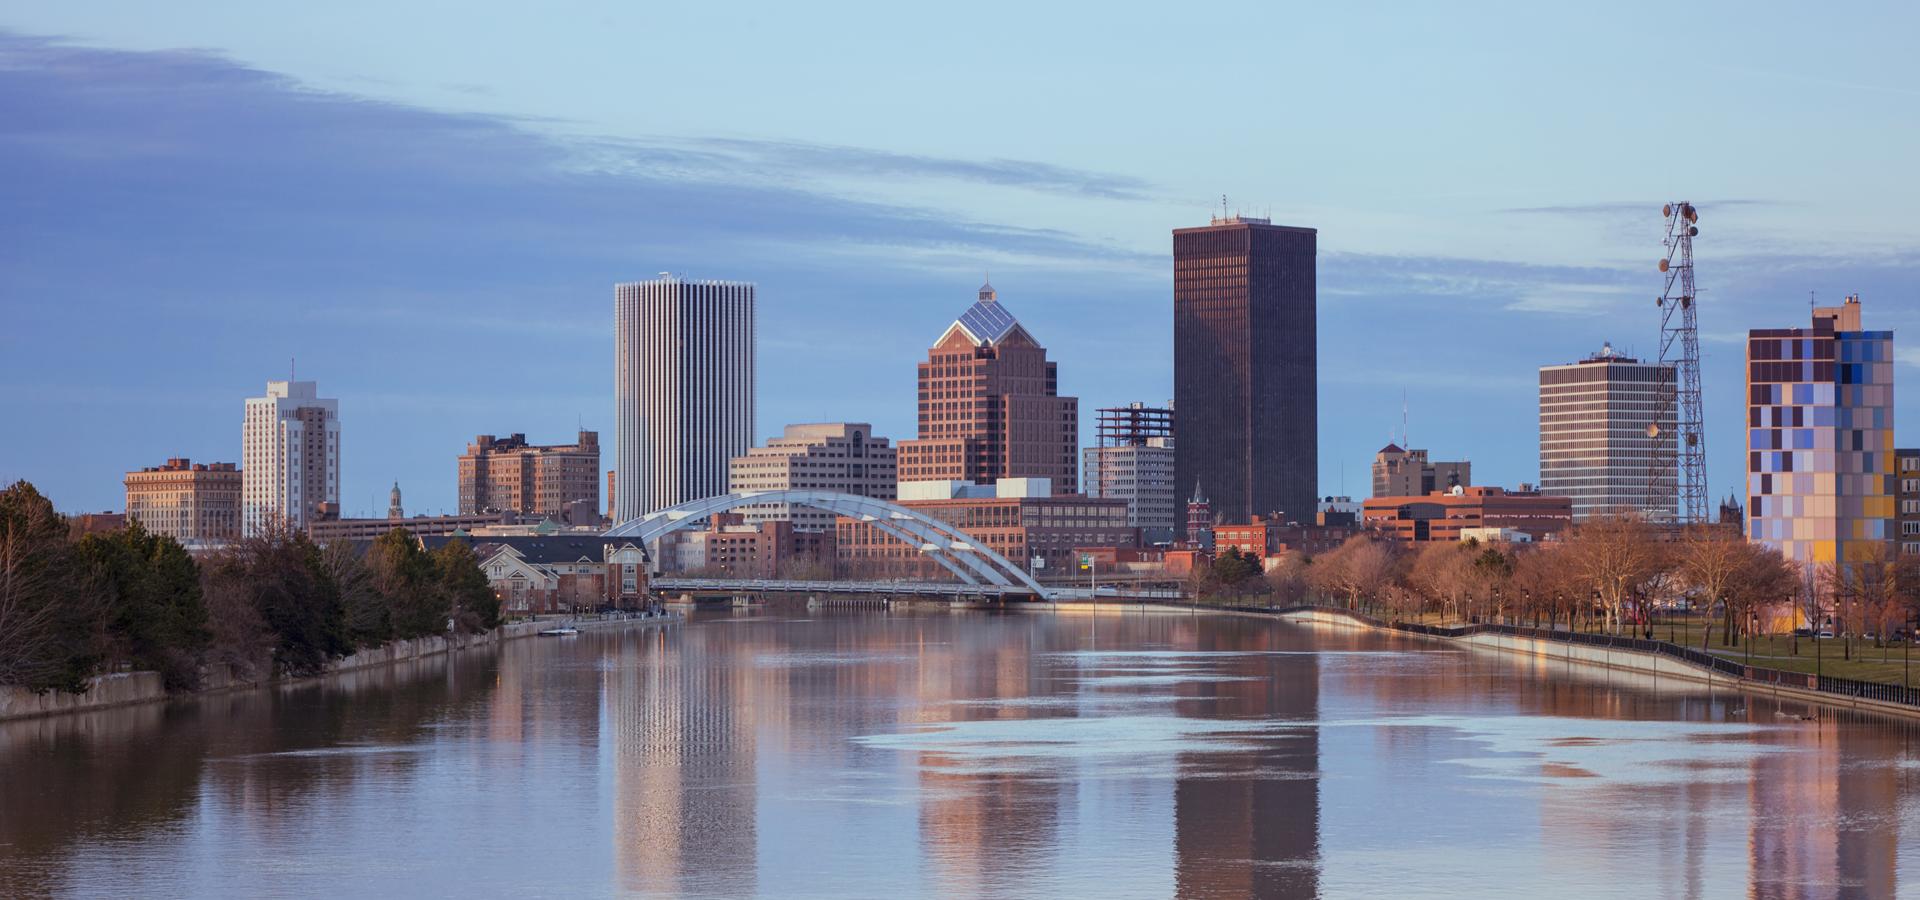 <b>Rochester, New York, USA</b>